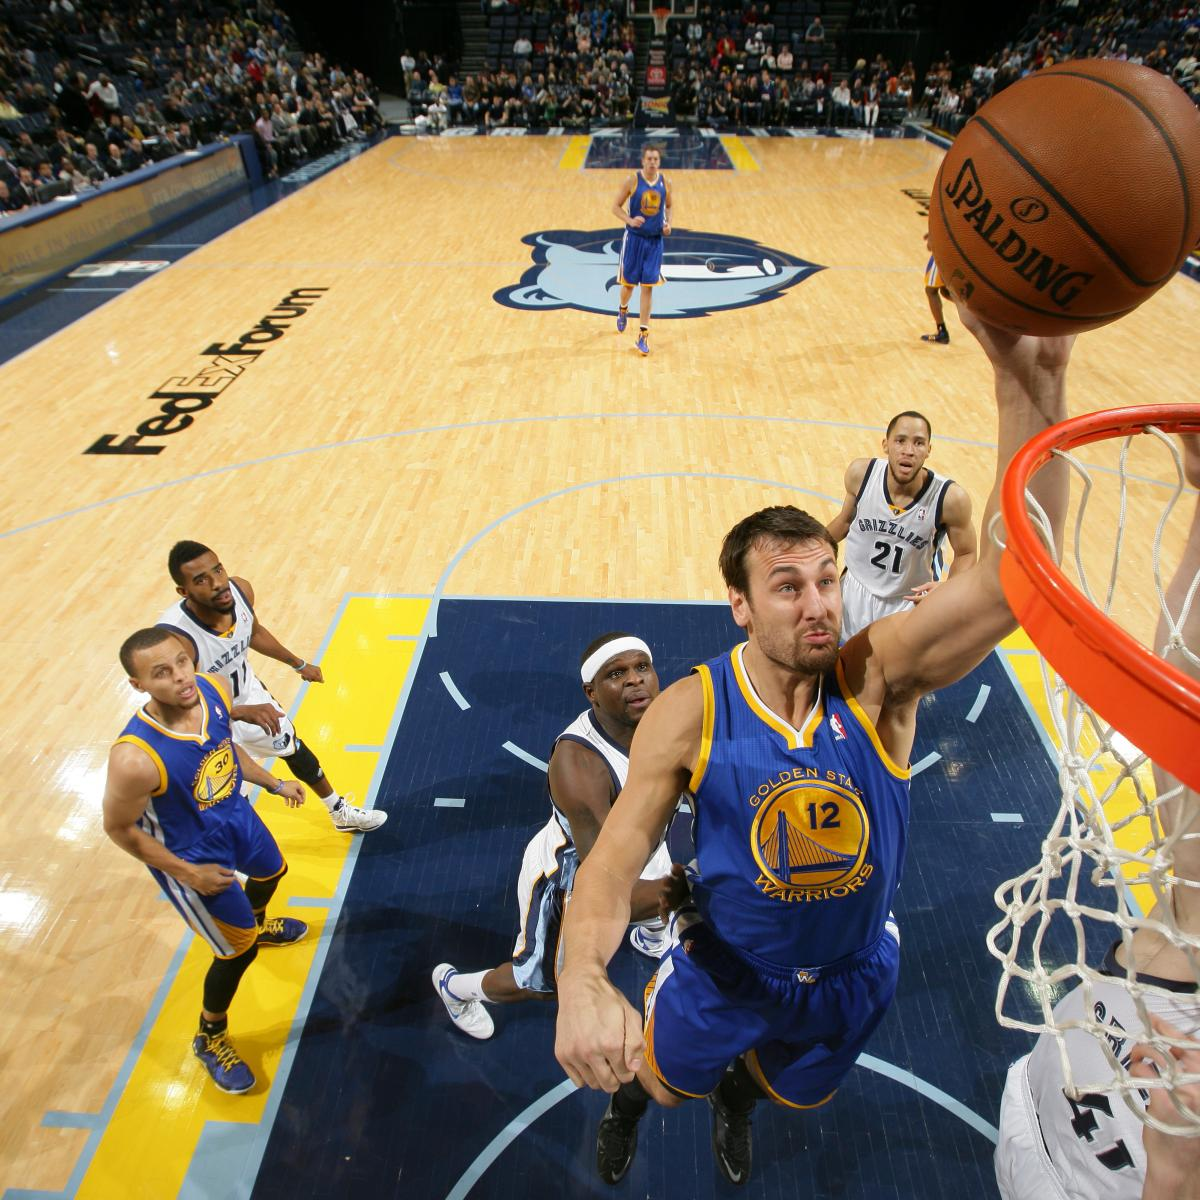 Warriors Movie Clips: Golden State Warriors Vs. Memphis Grizzlies: Live Score